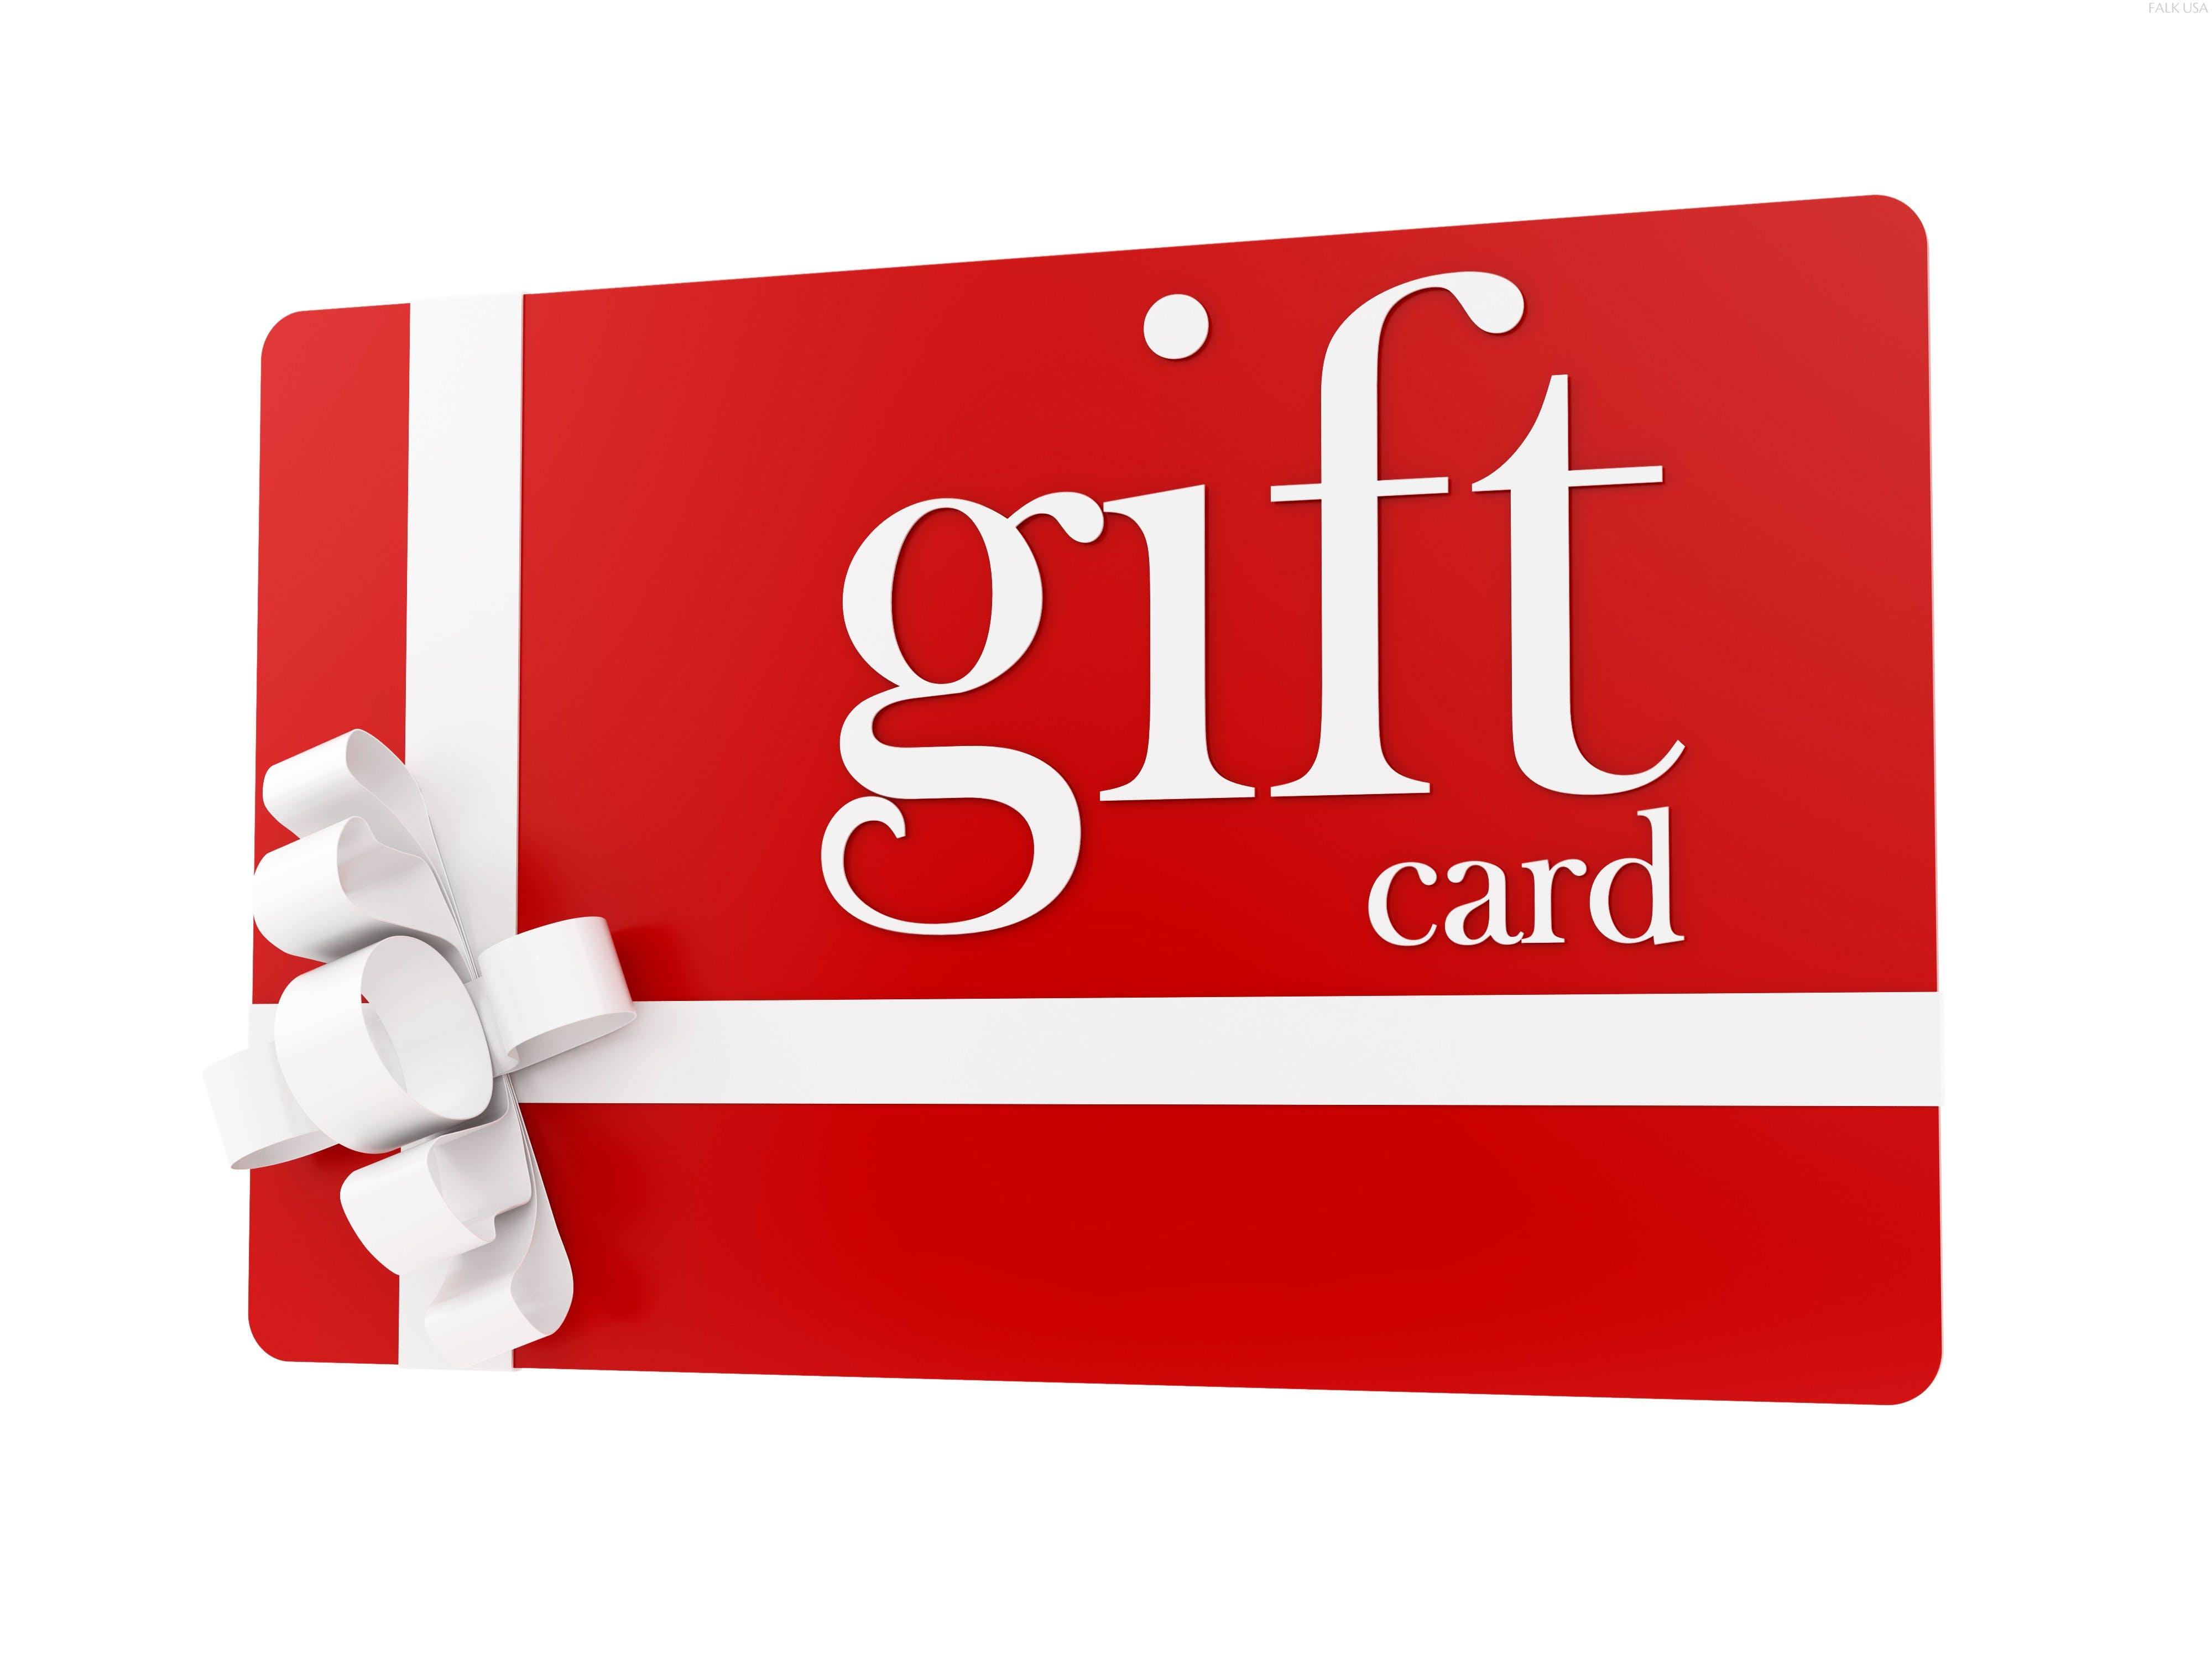 Gift card 3 art